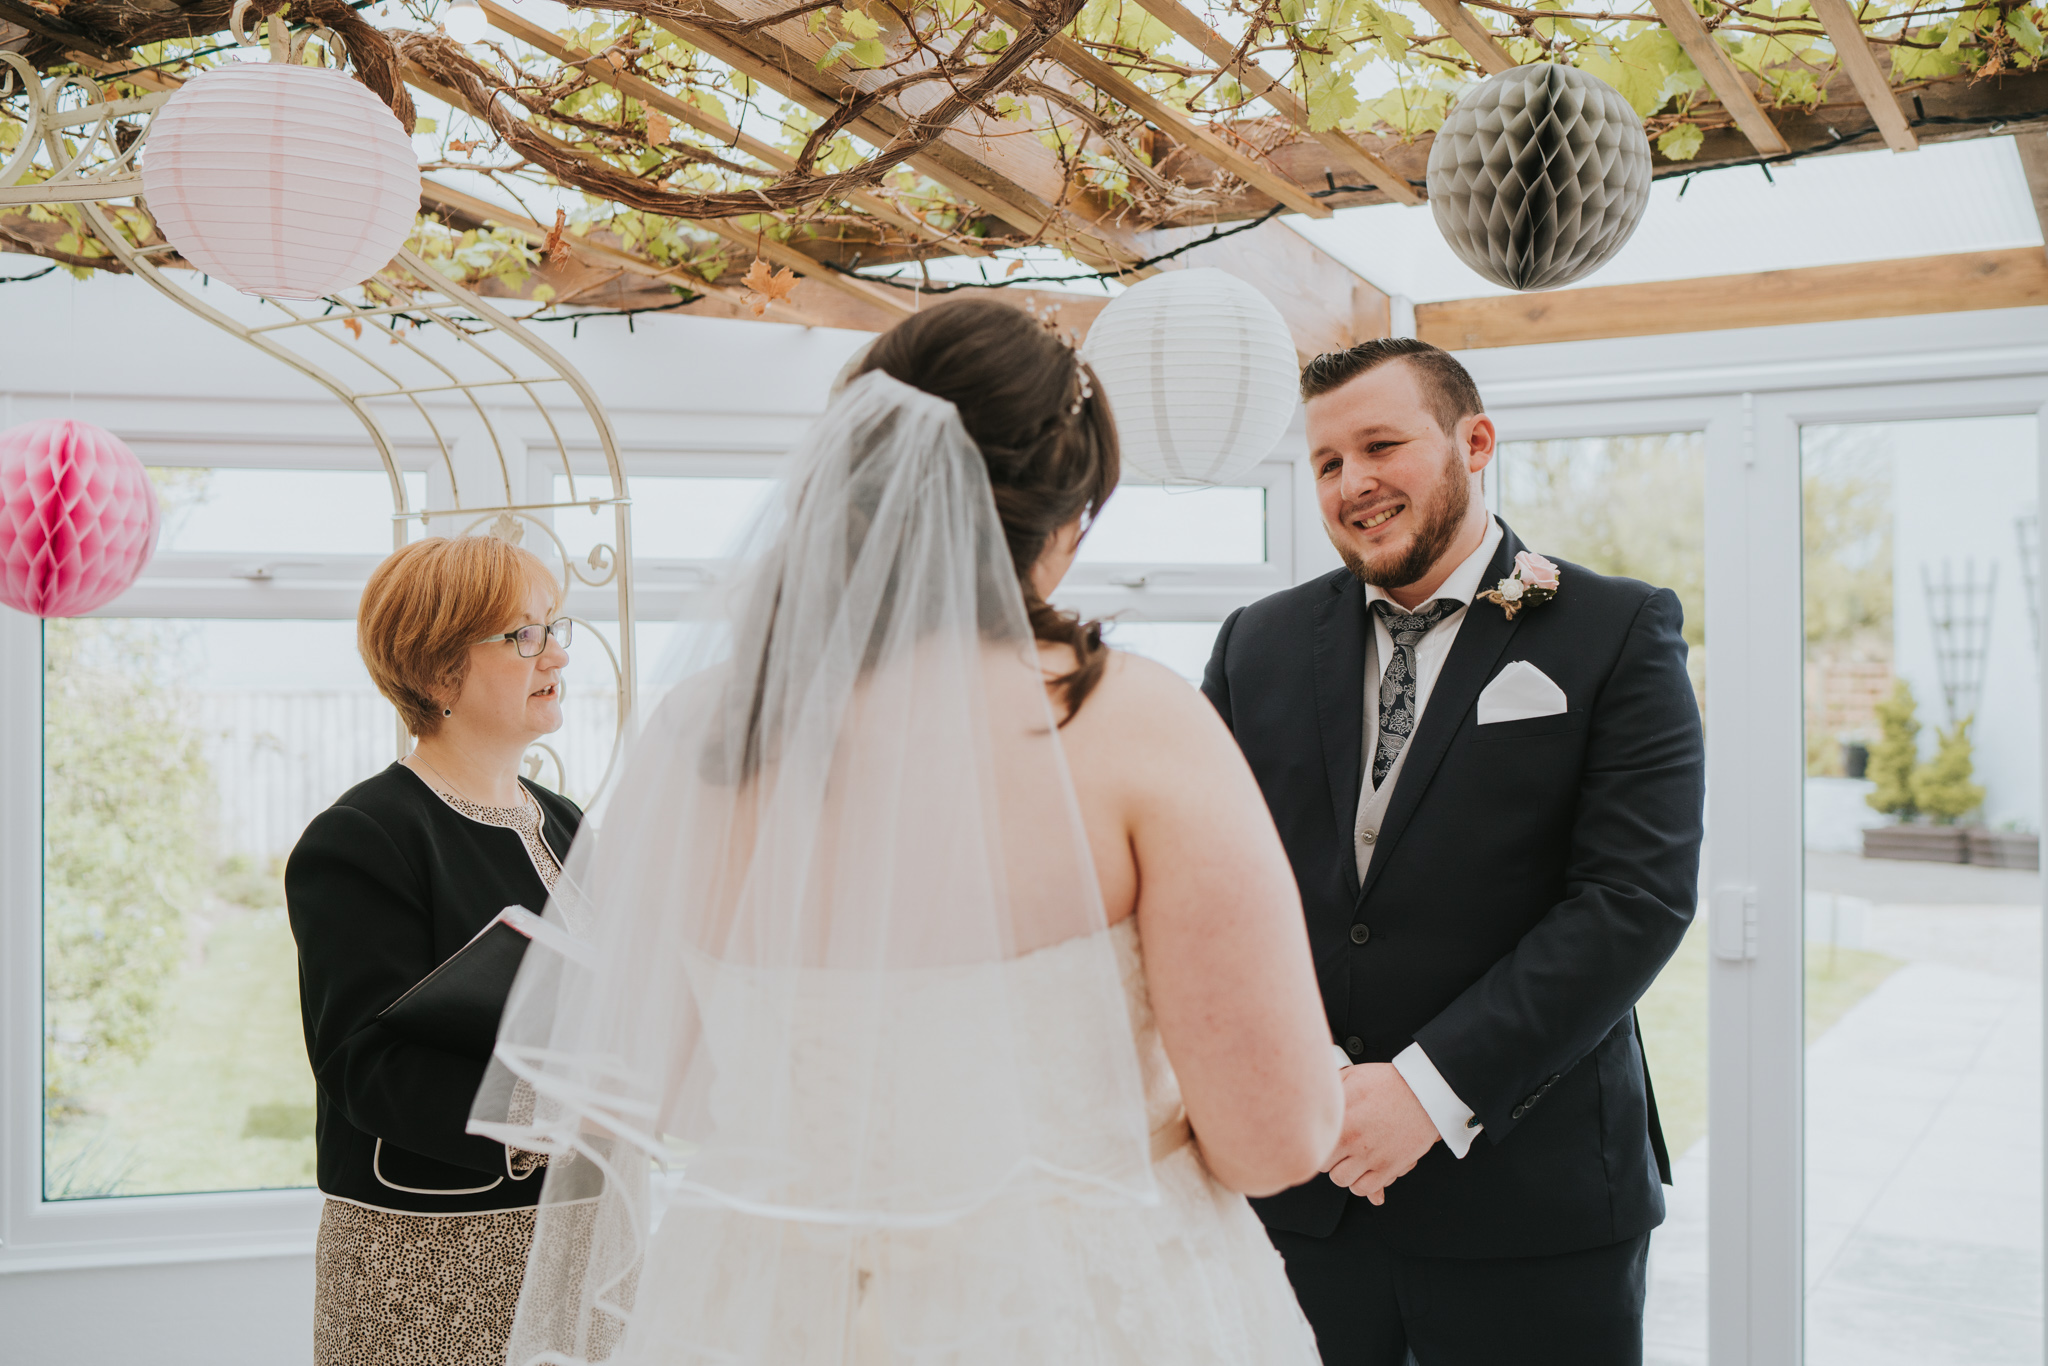 grace-sam-old-barn-clovelly-devon-wedding-photographer-grace-elizabeth-essex-suffolk-norfolk-wedding-photographer (52 of 132).jpg